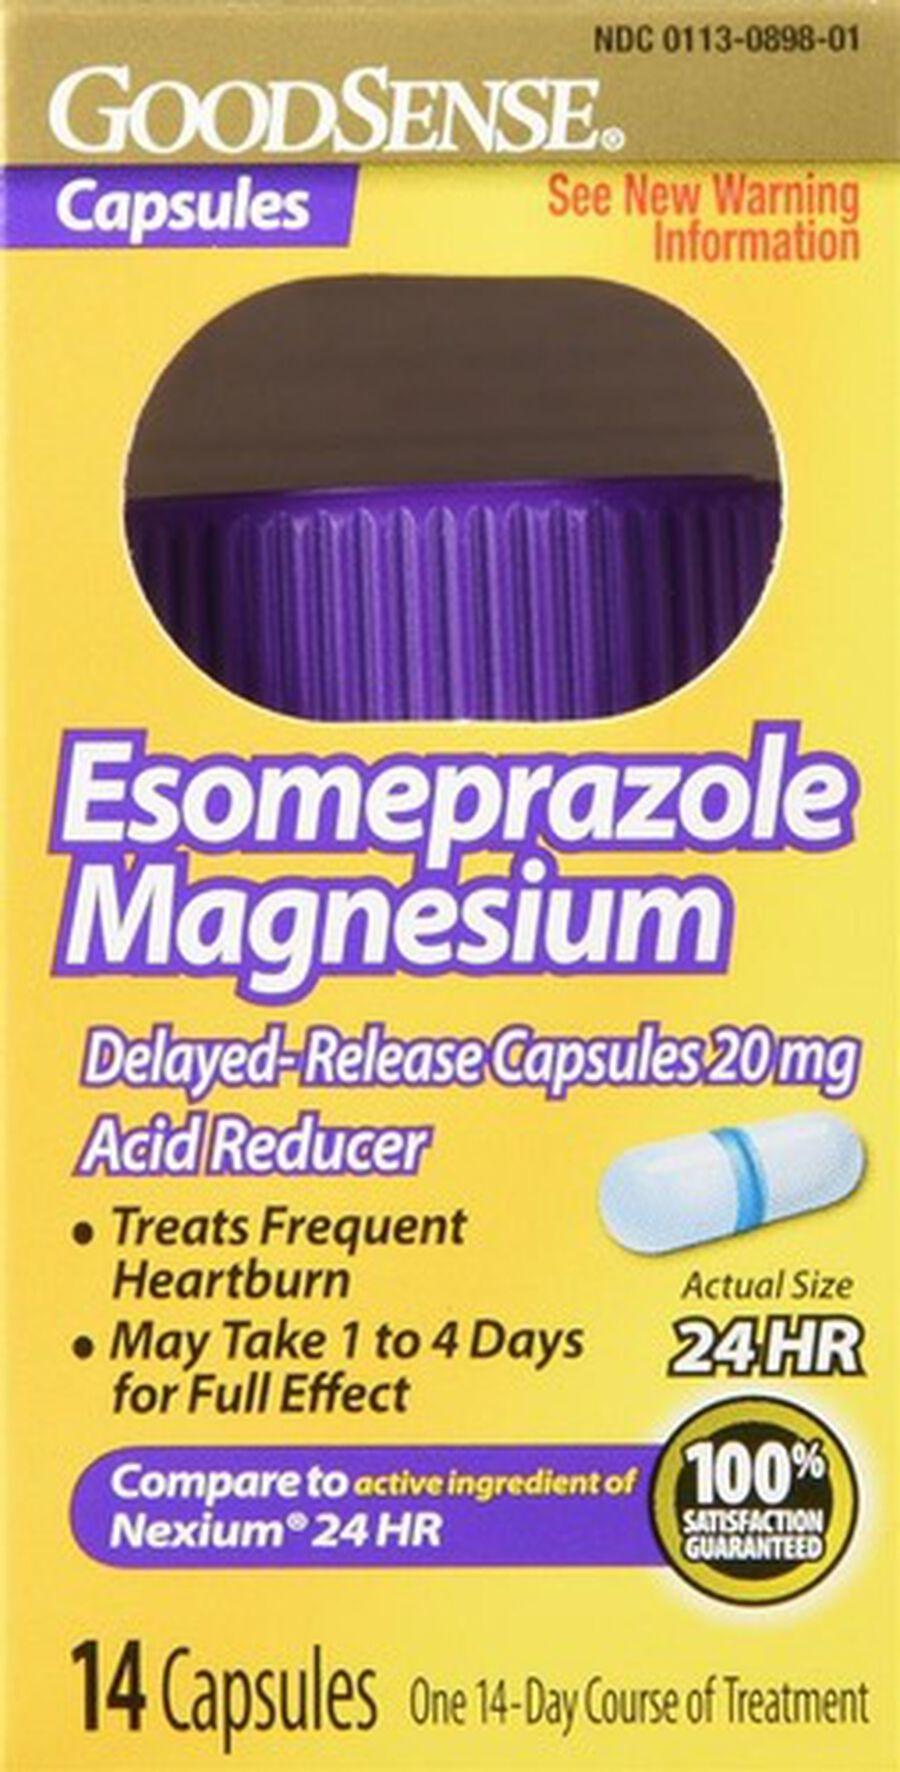 GoodSense® Esomeprazole Magnesium 20 MG, 24- Hr Delayed Release Capsules, 14 ct, , large image number 0